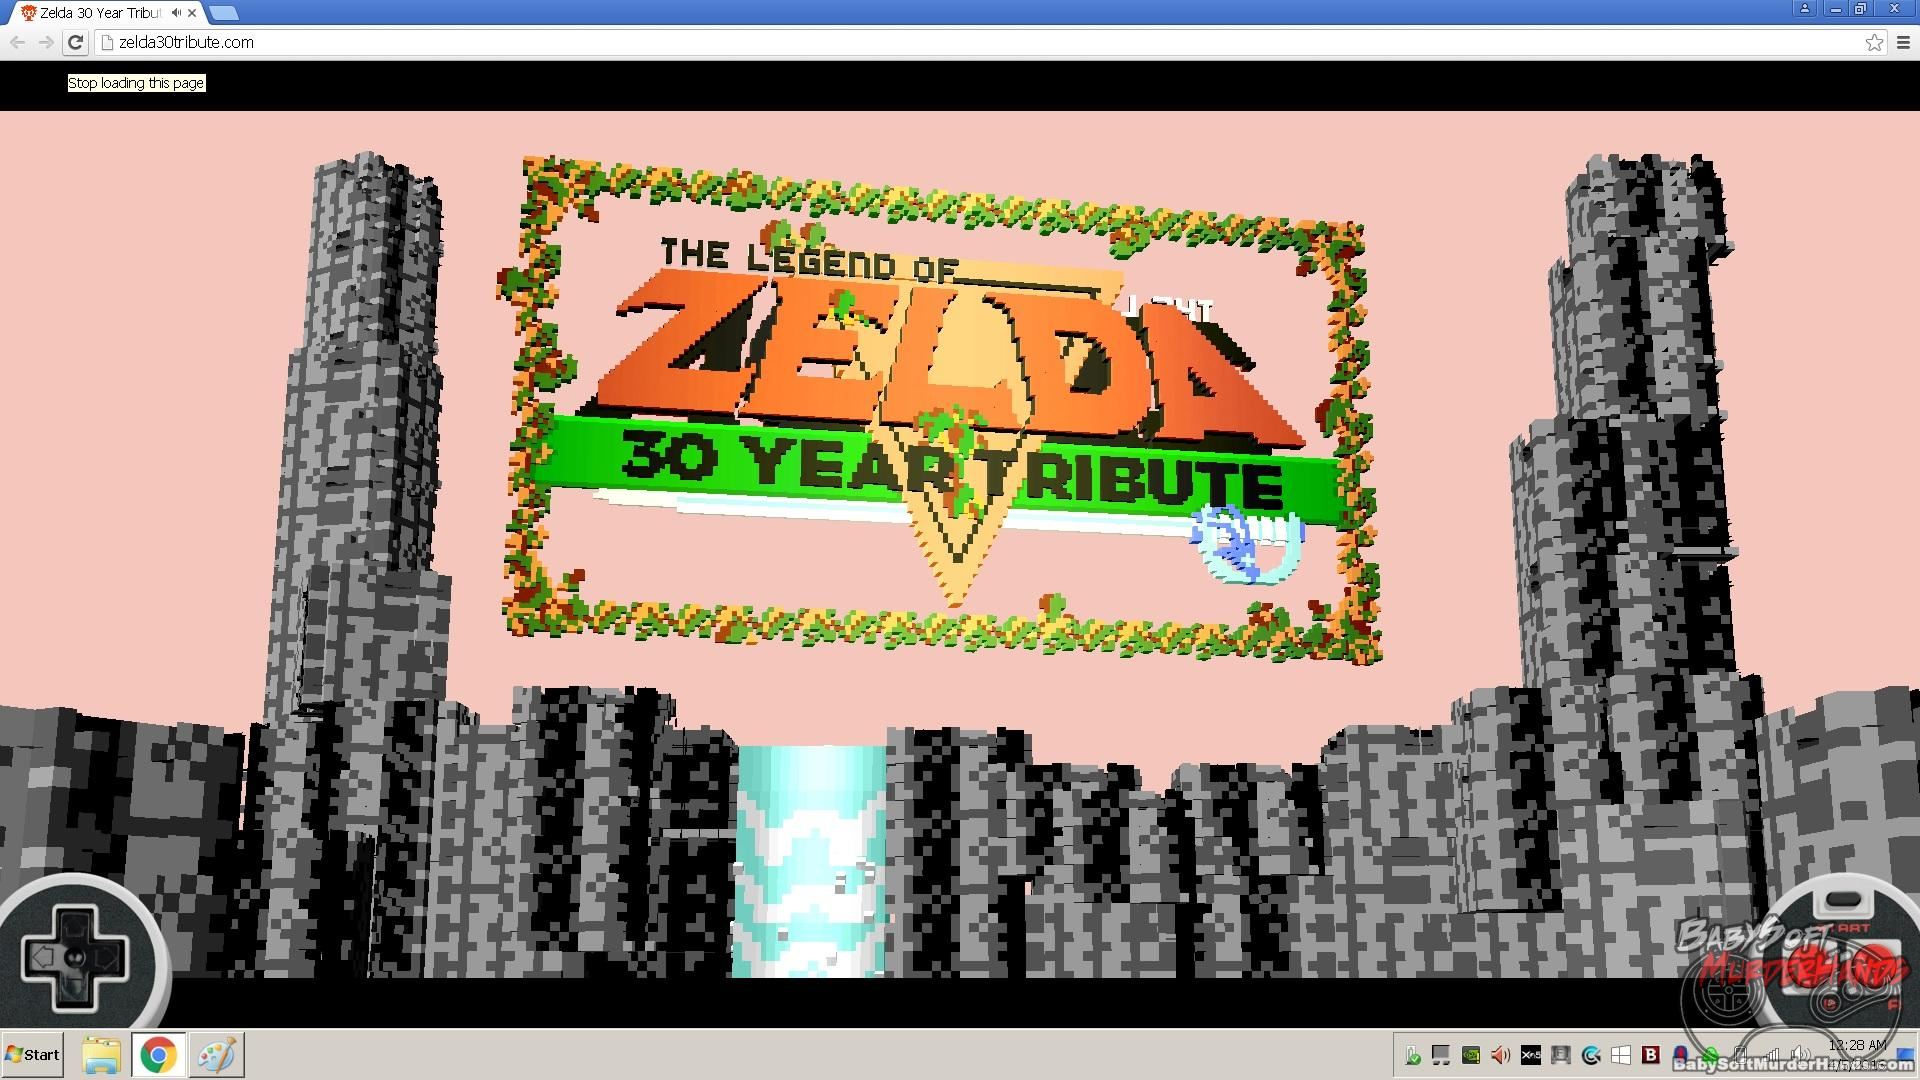 Cool 3D remake of the original Zelda runs in your browser